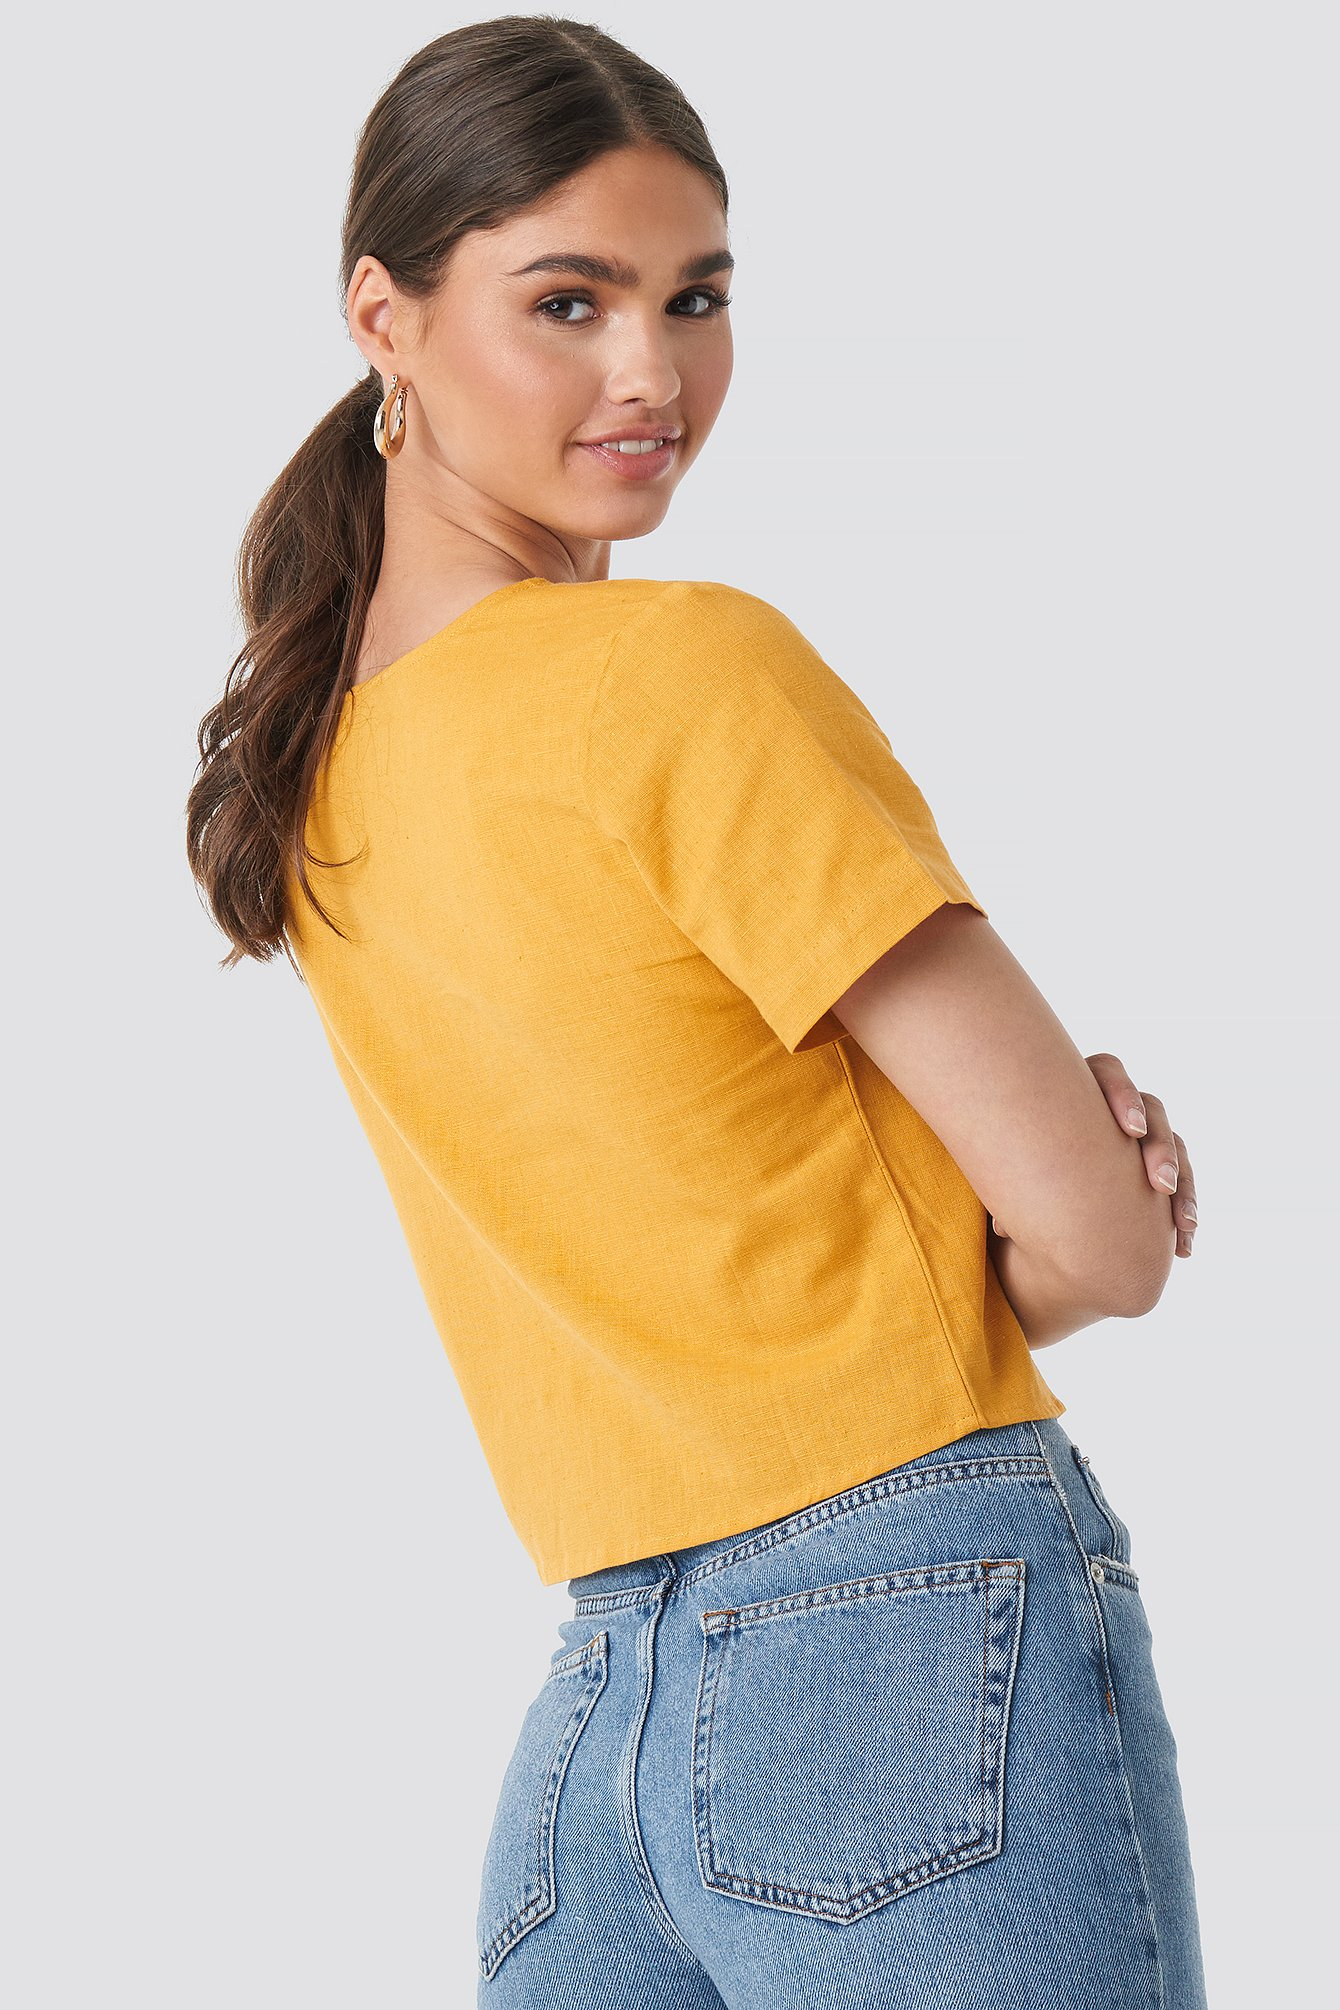 Linen Look Buttoned Top NA-KD.COM